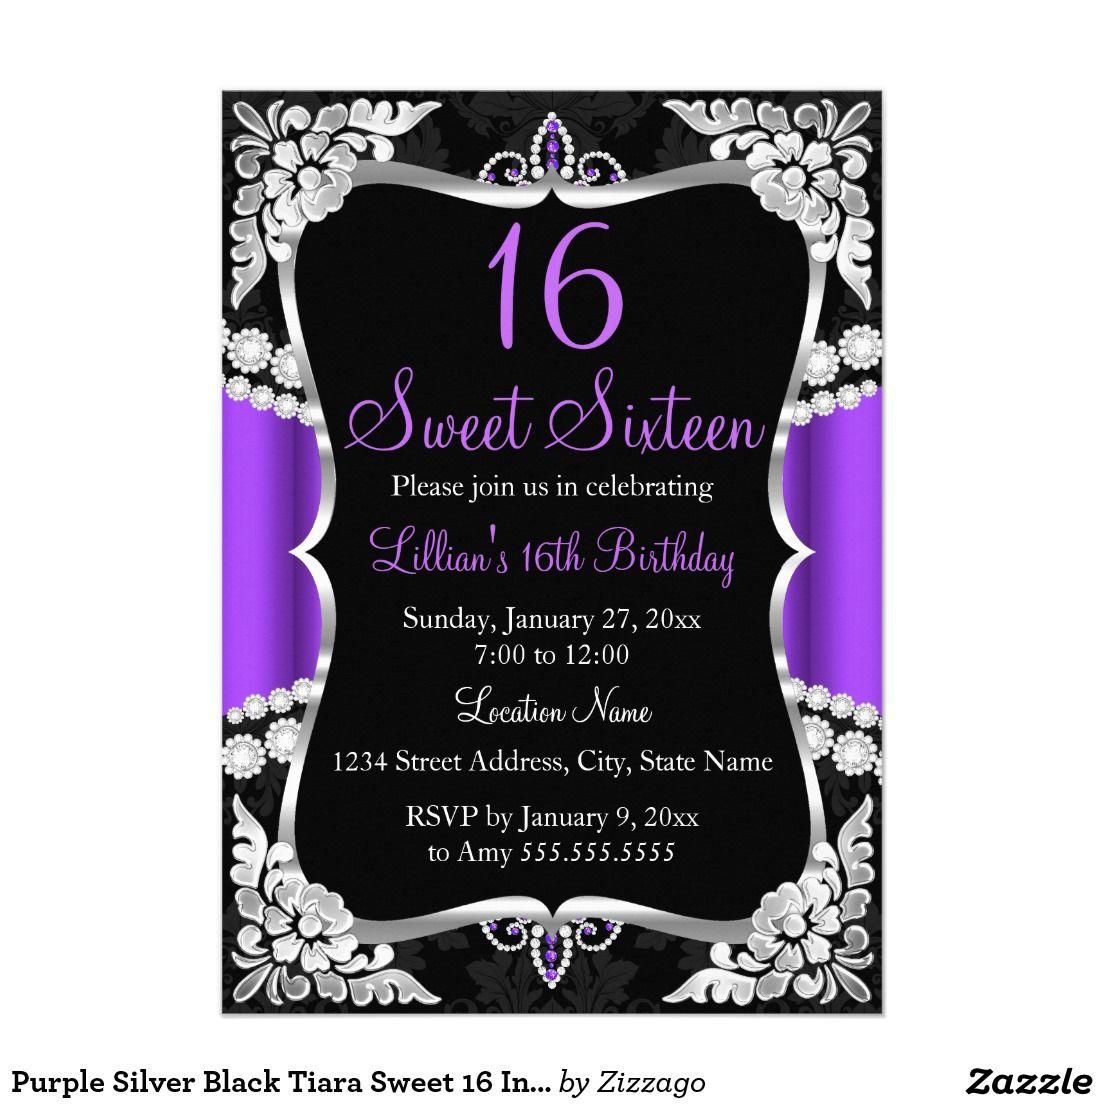 purple silver black tiara sweet 16